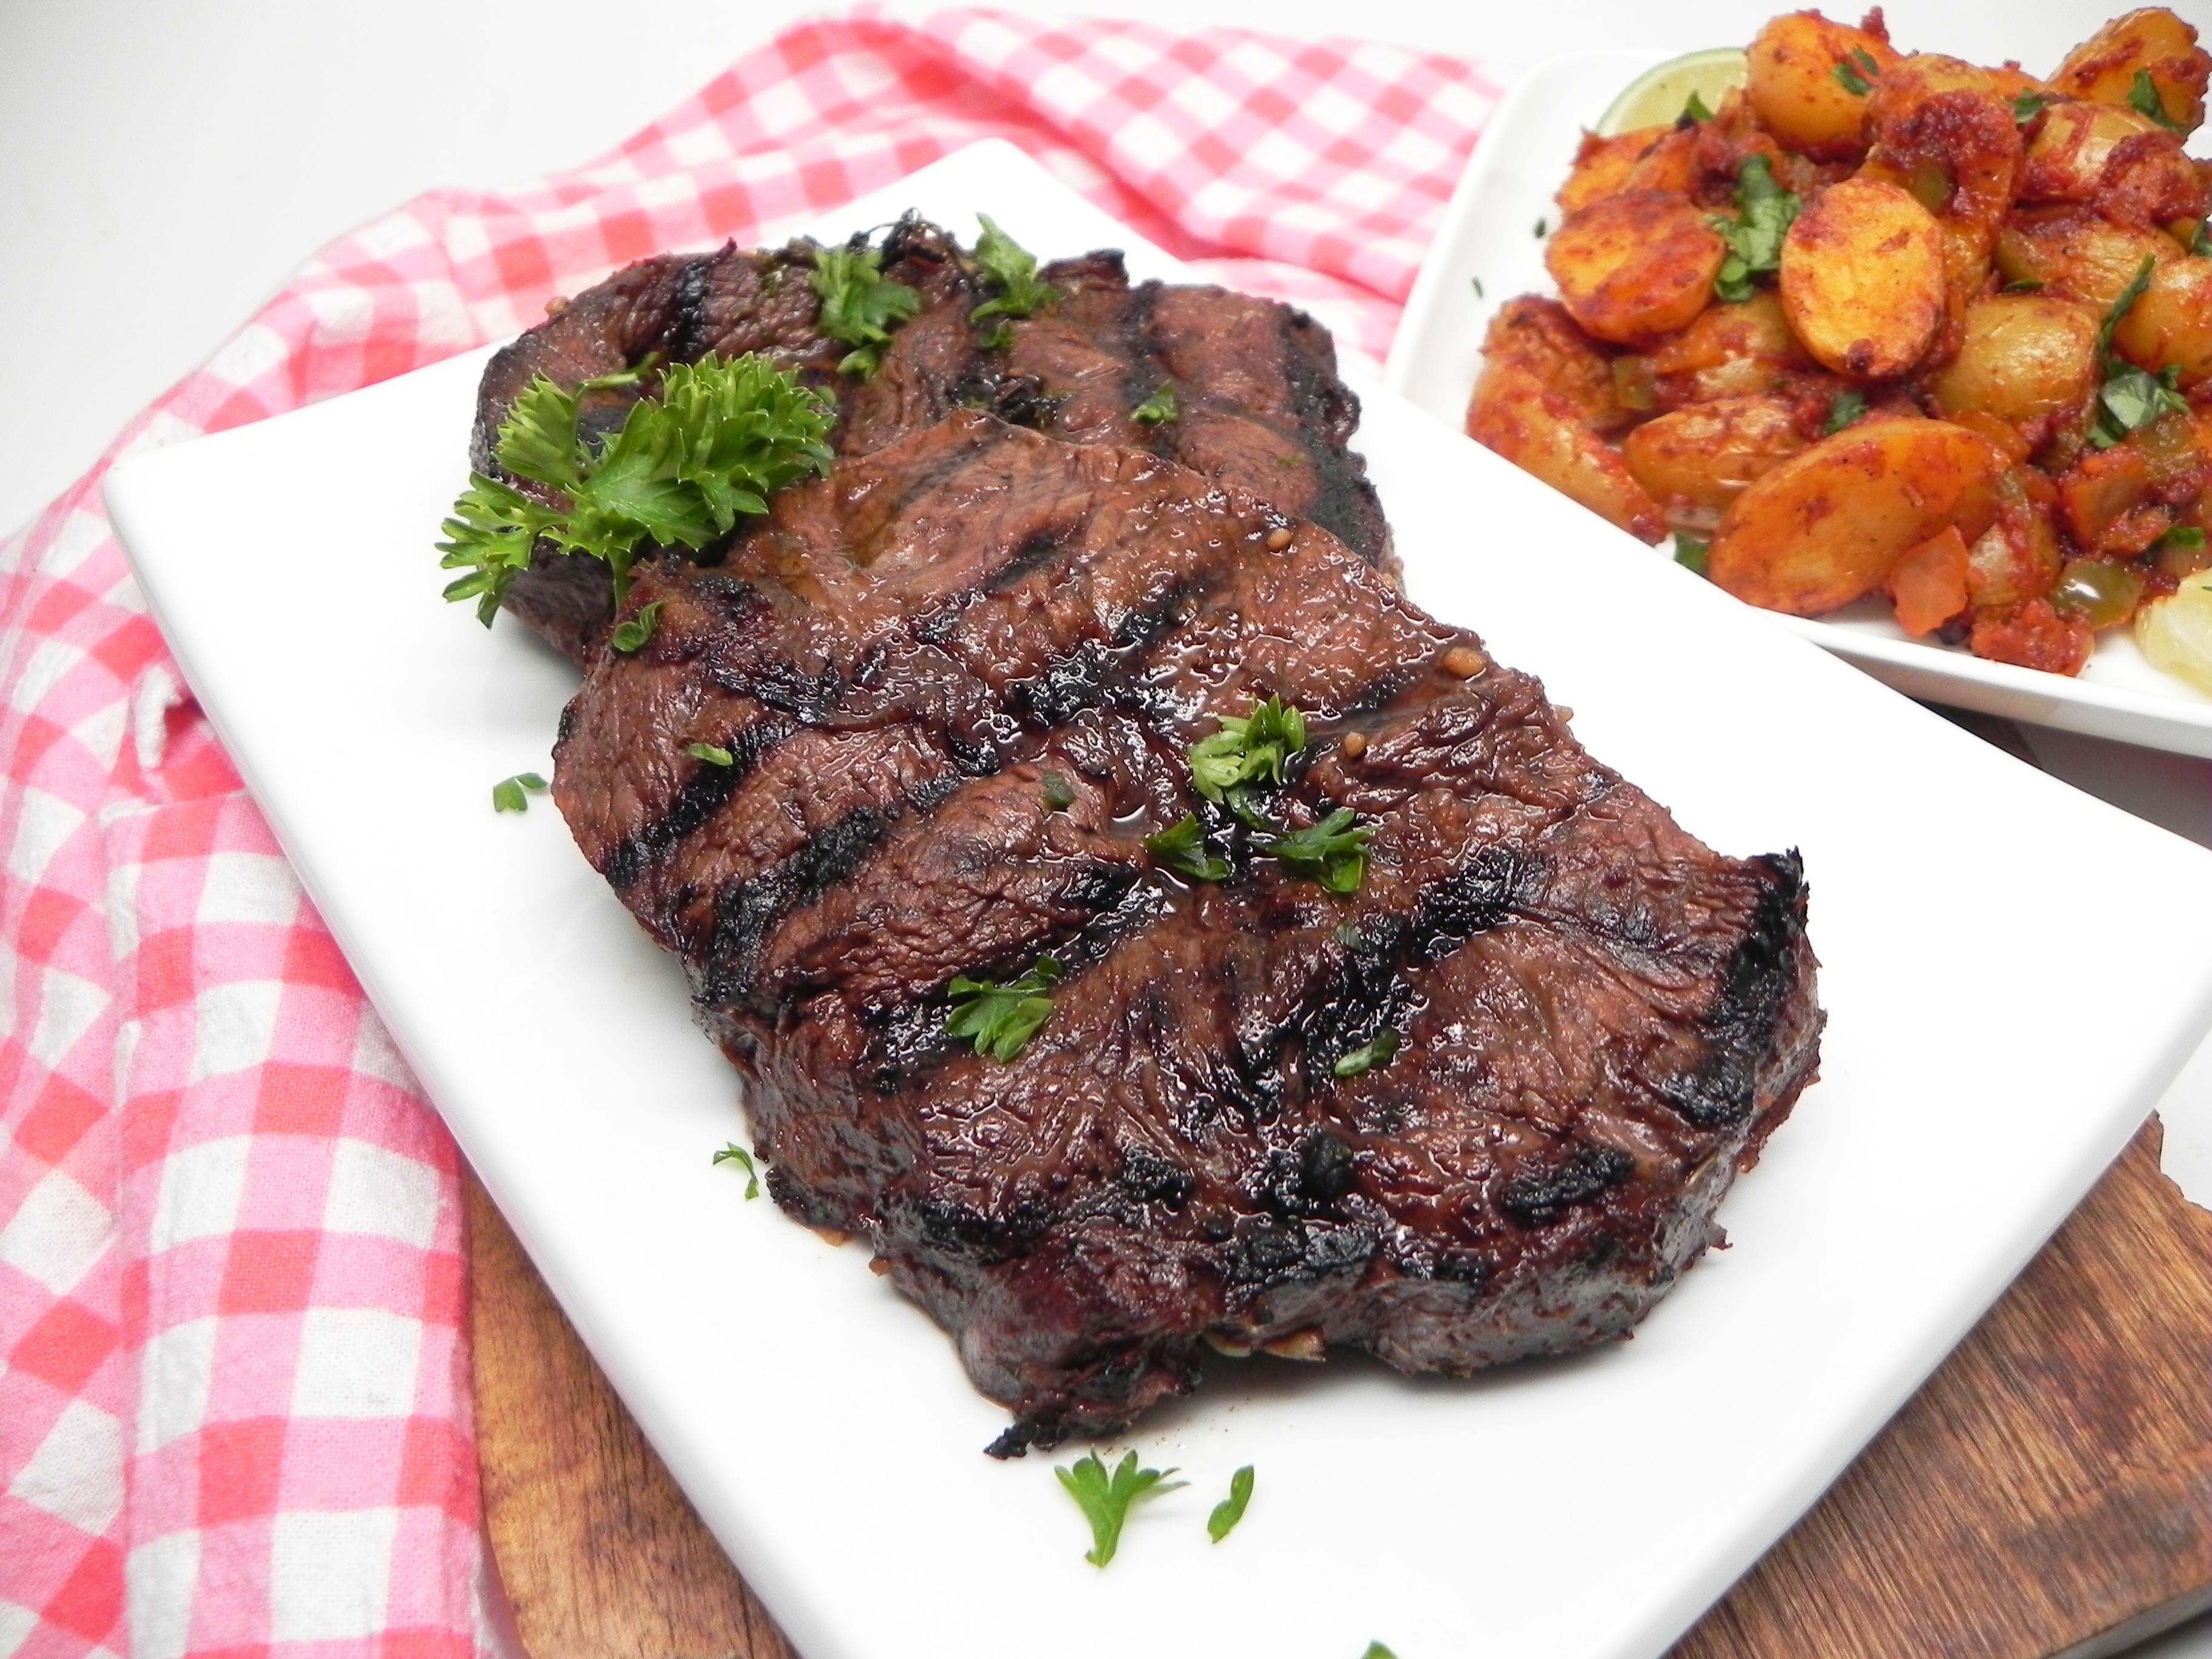 Garlic and Herb Marinade for Steak